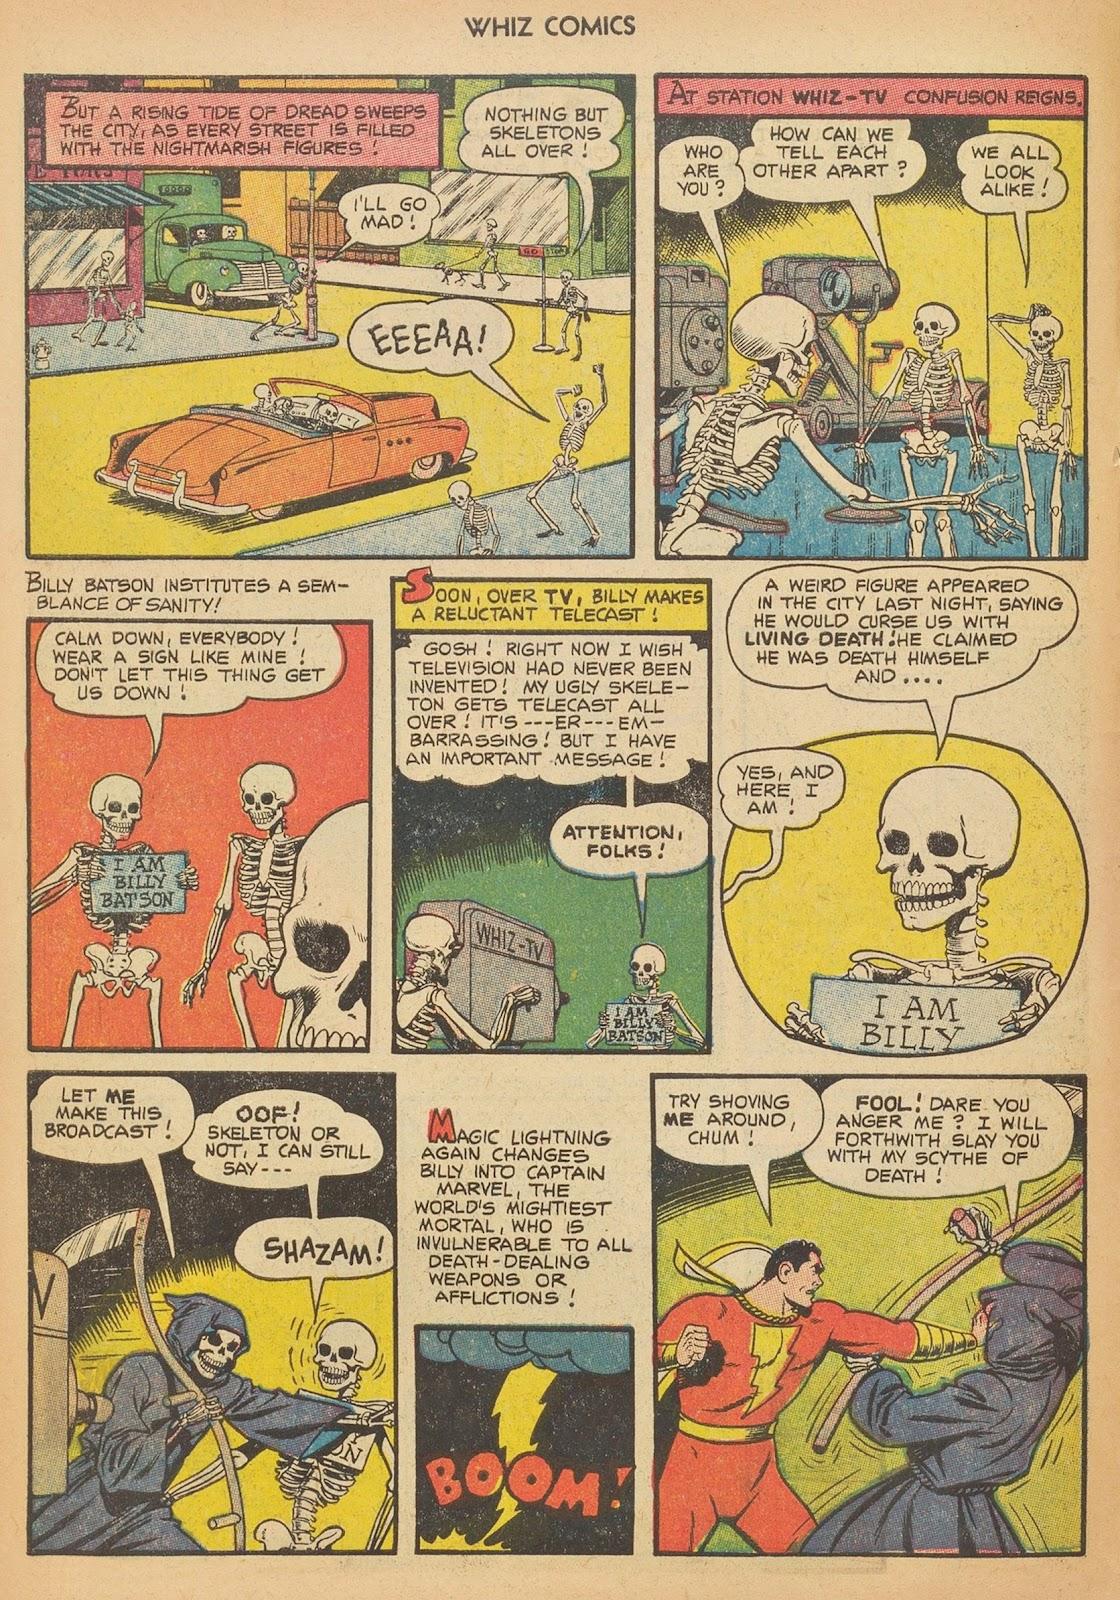 Read online WHIZ Comics comic -  Issue #153 - 6